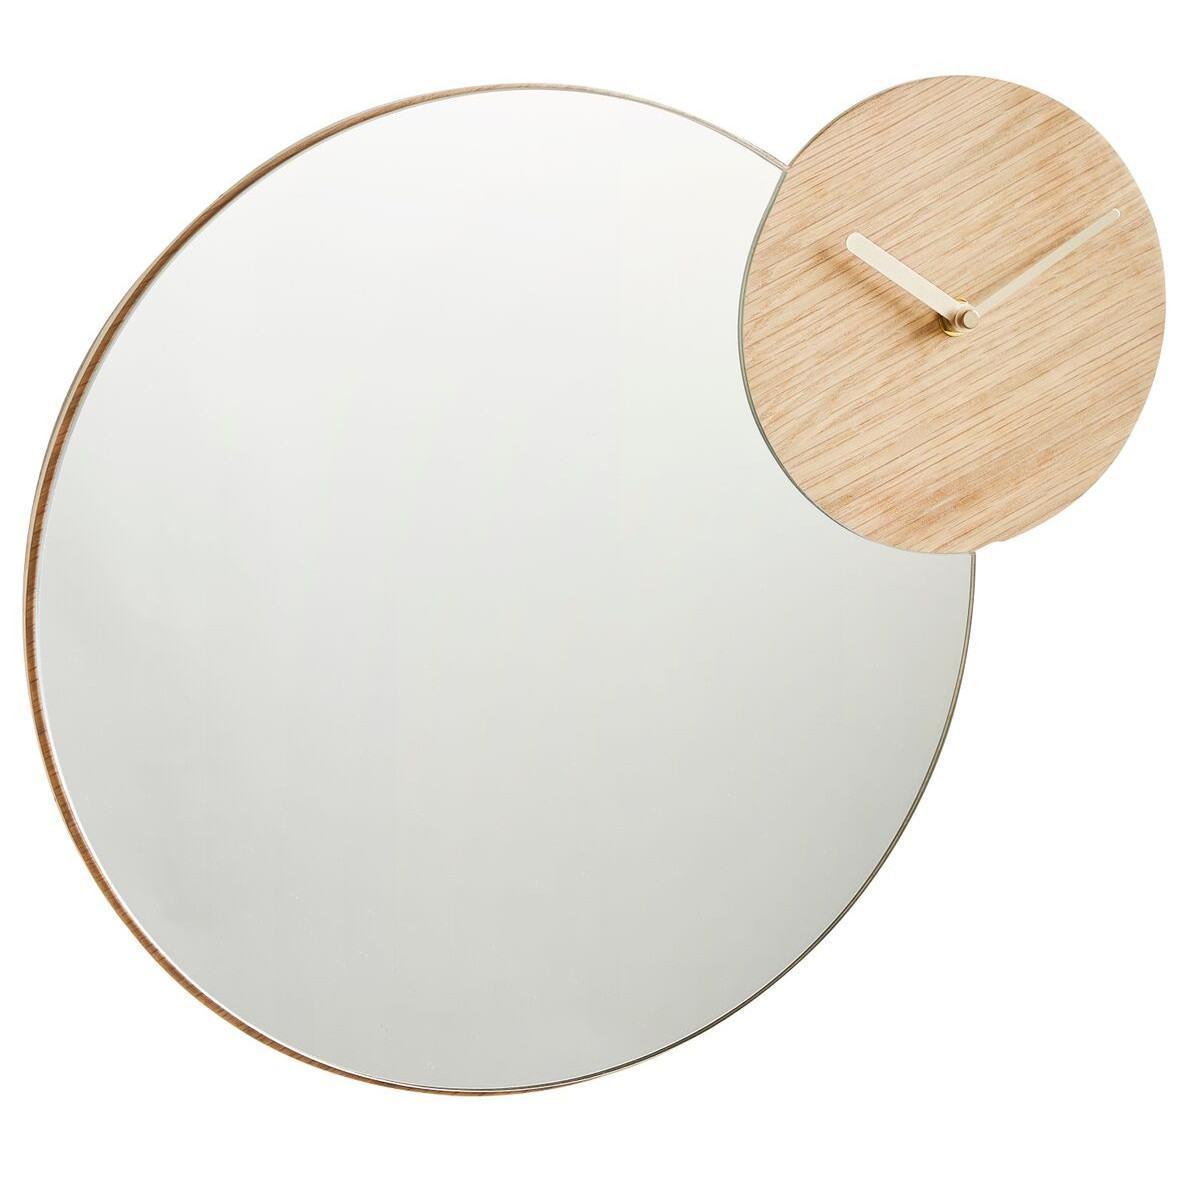 Woud Timewatch Mirror